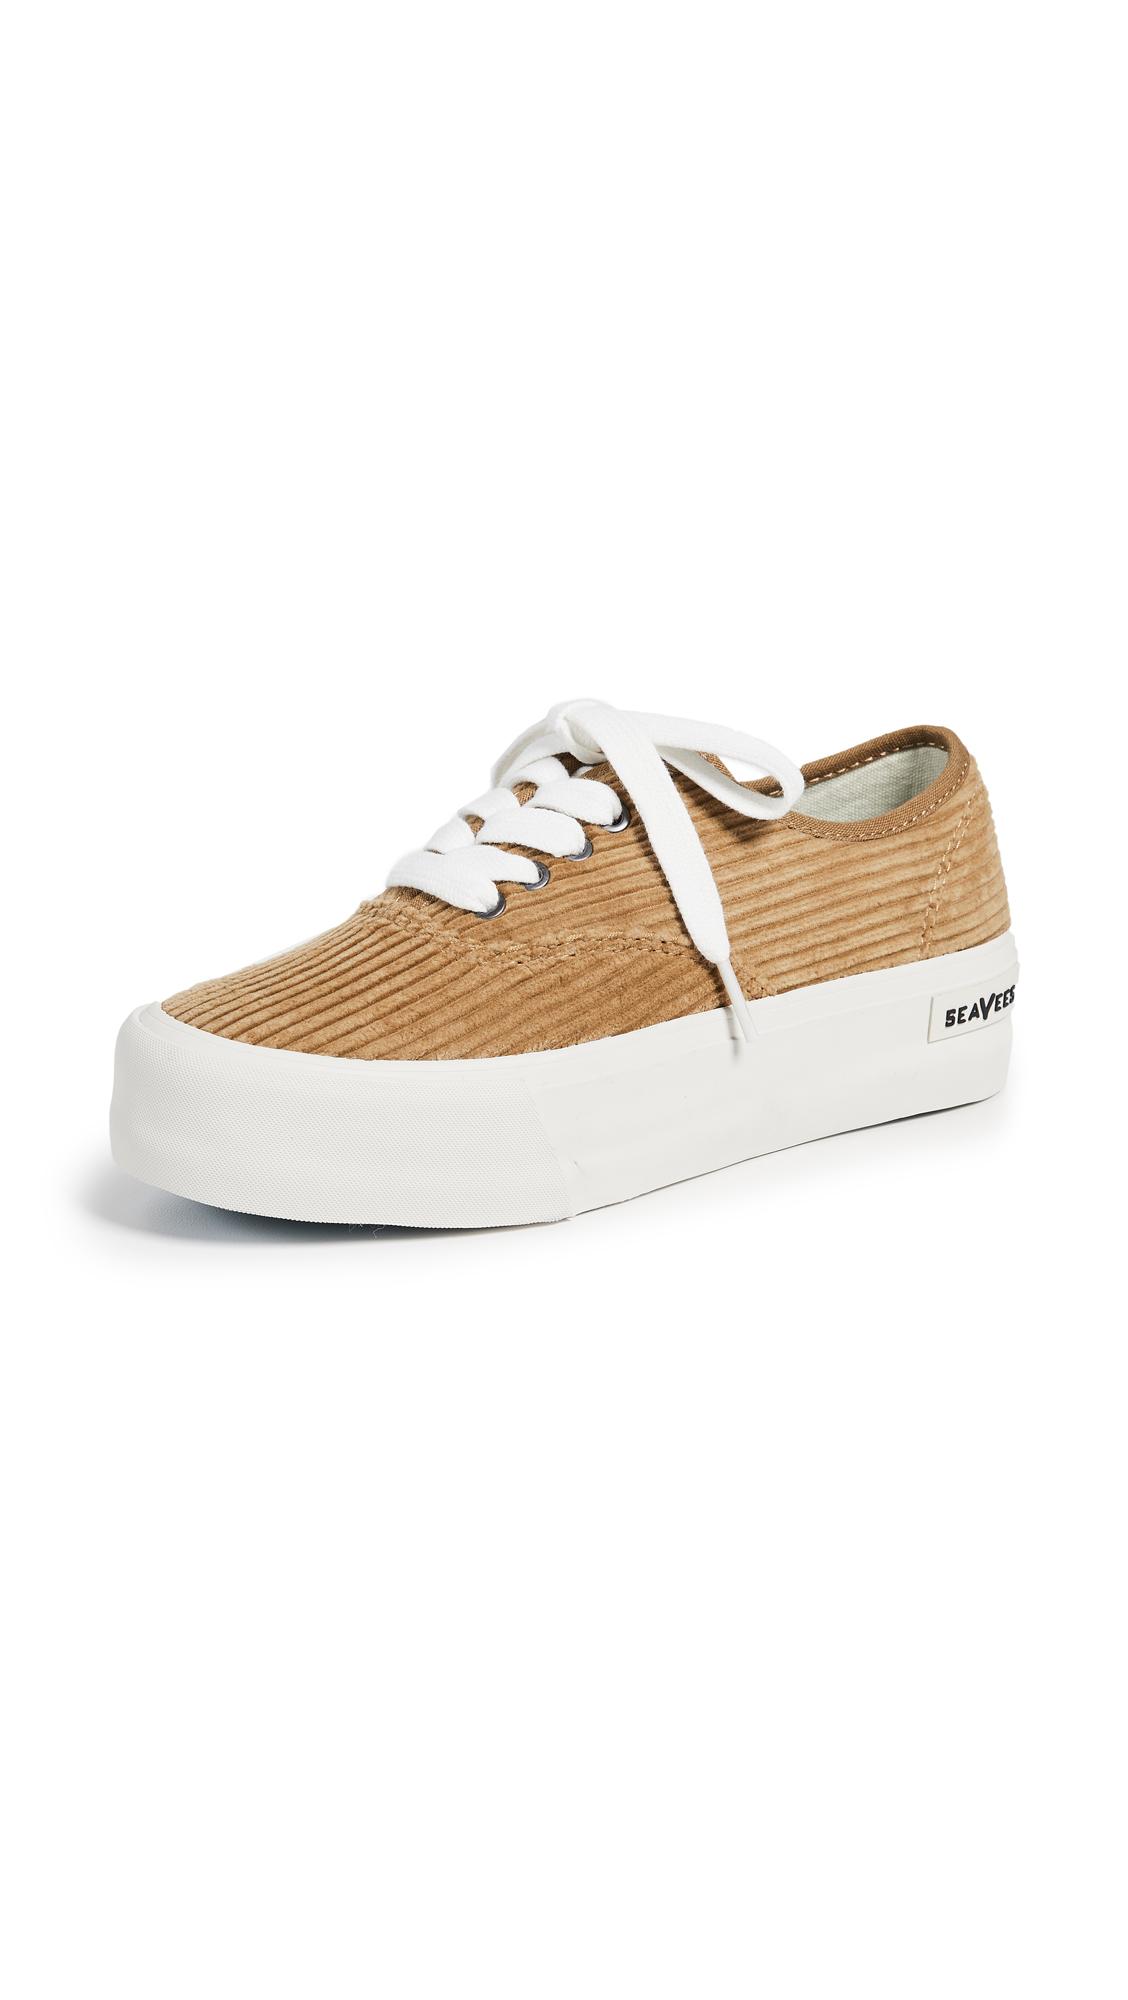 SeaVees Legend Sneakers - Golden Brown